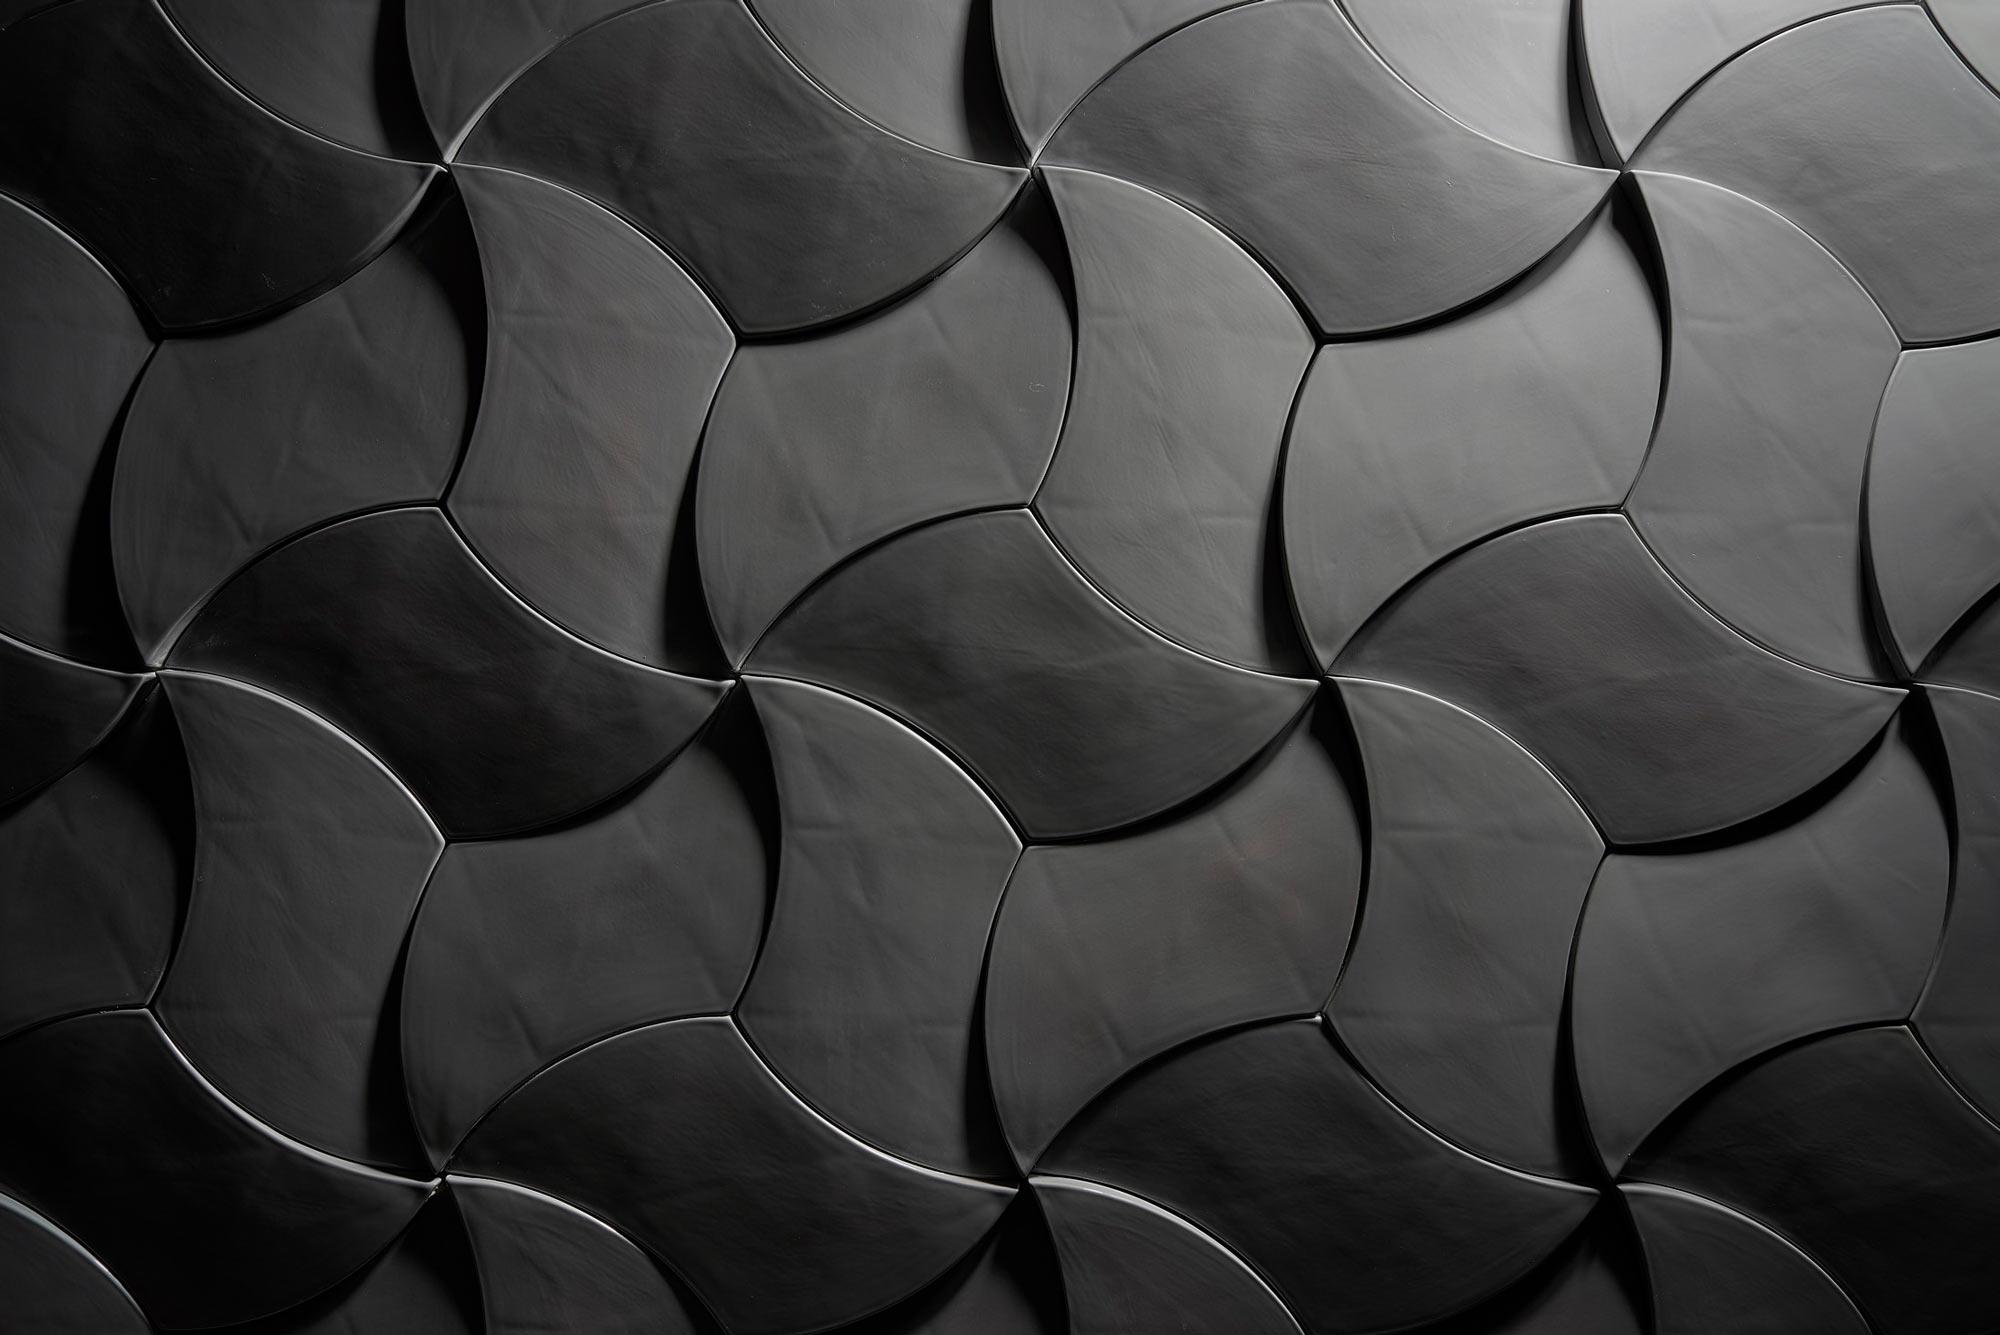 keramik-wandpaneele-wandfliesen-shiny-swirl